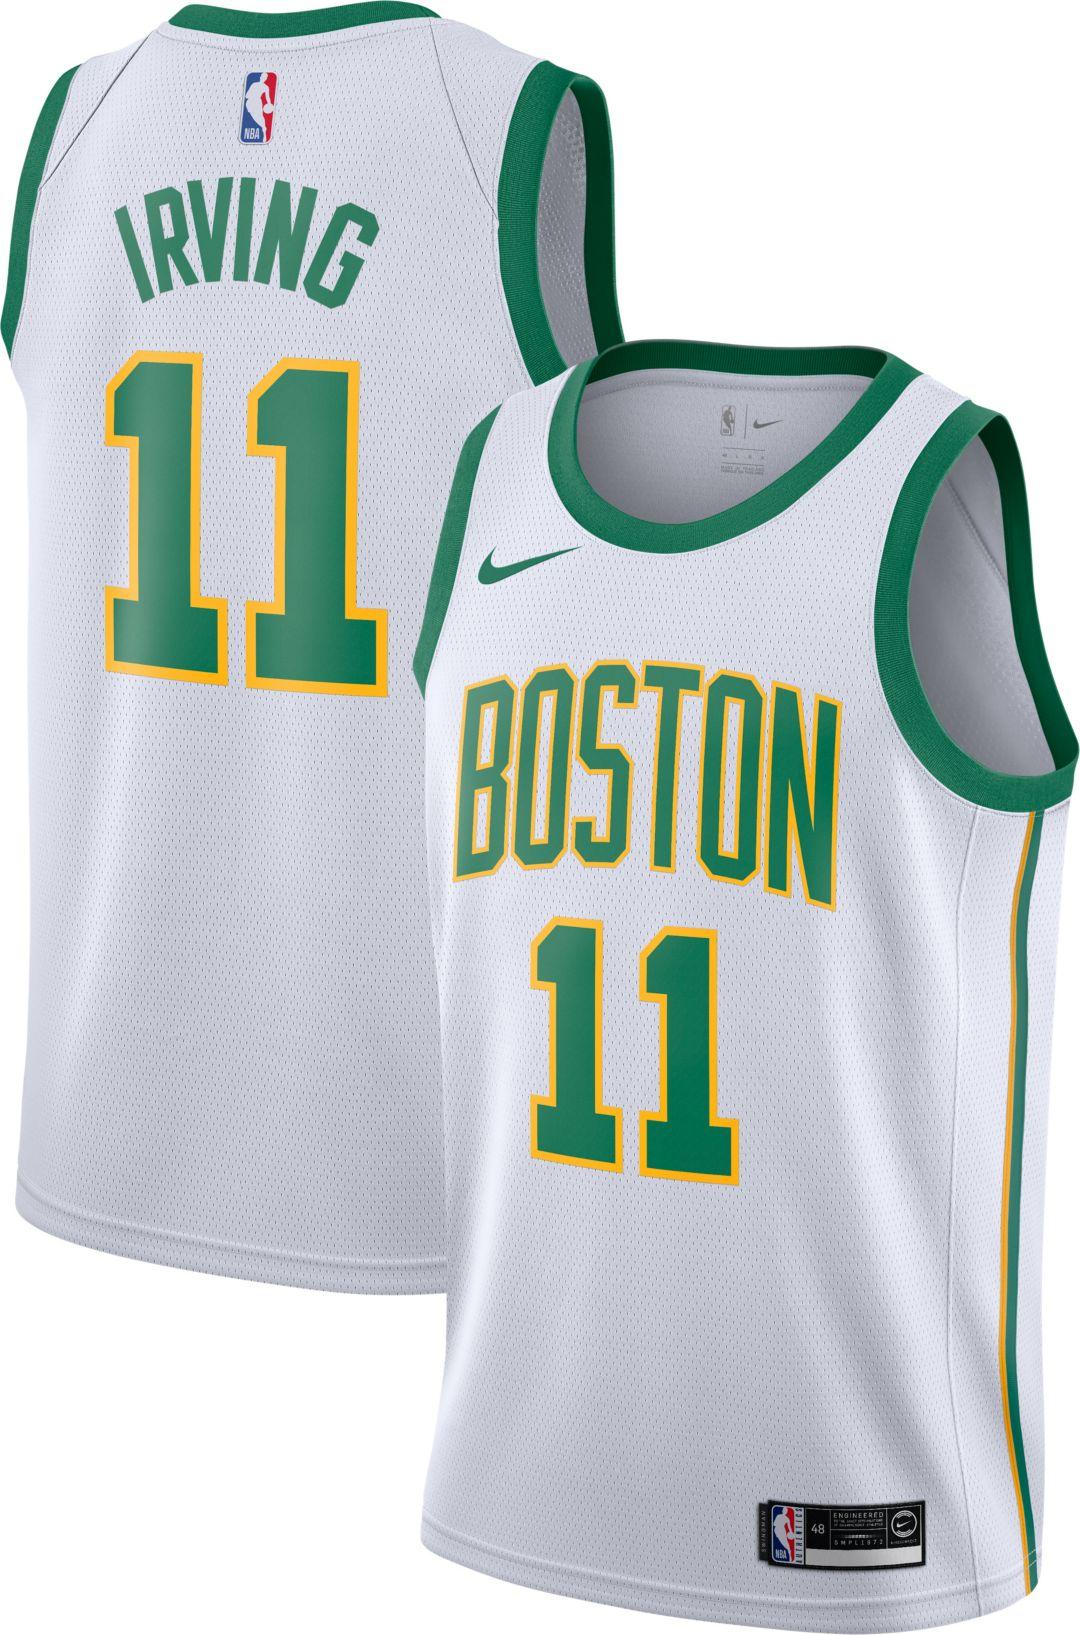 73436699ea5 Nike Men's Boston Celtics Kyrie Irving Dri-FIT City Edition Swingman Jersey  1